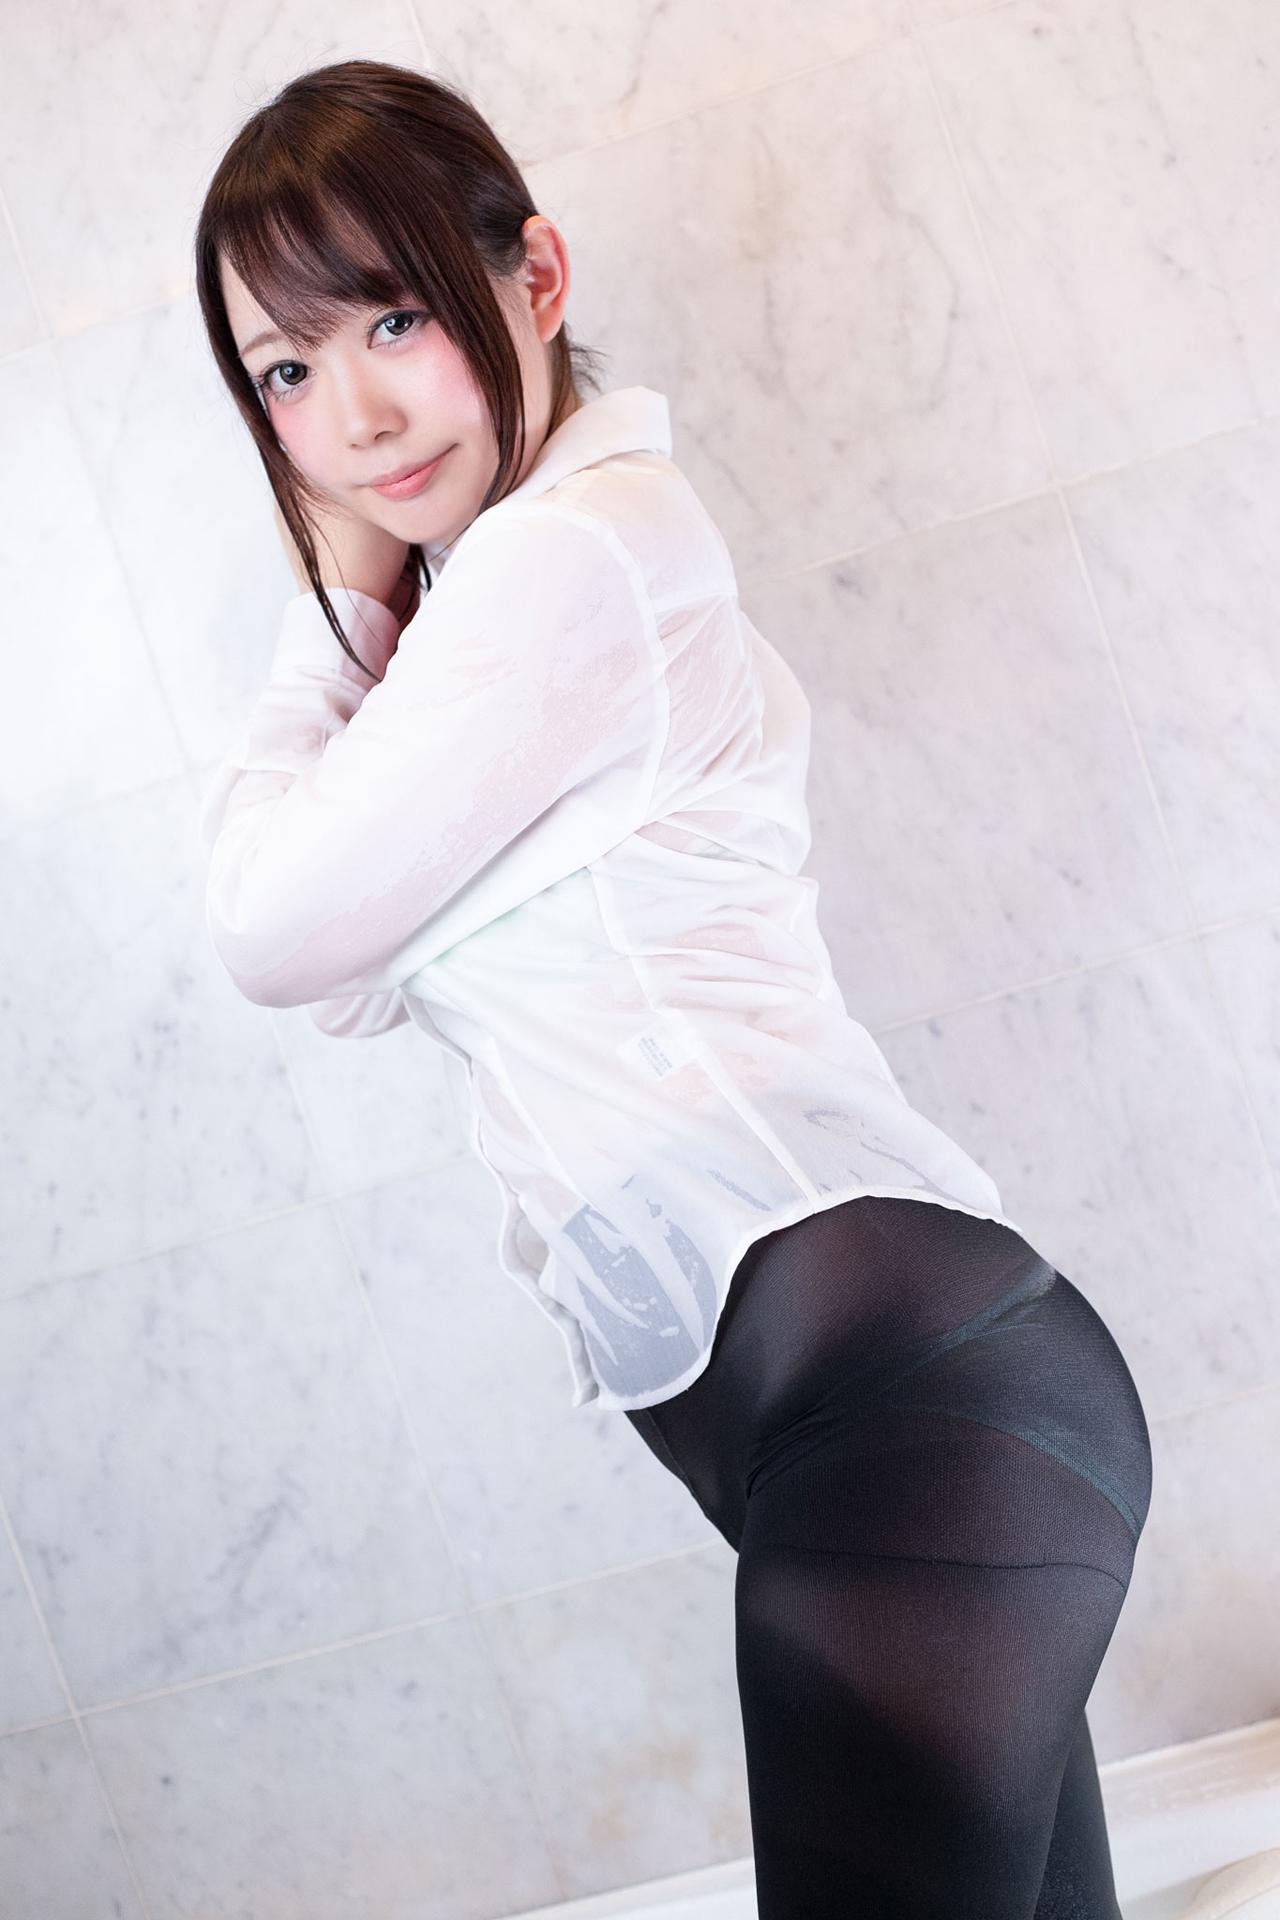 46——(C95)[prprDrop's(穂南しずく)]tightsな彼女 [156P|146M ]